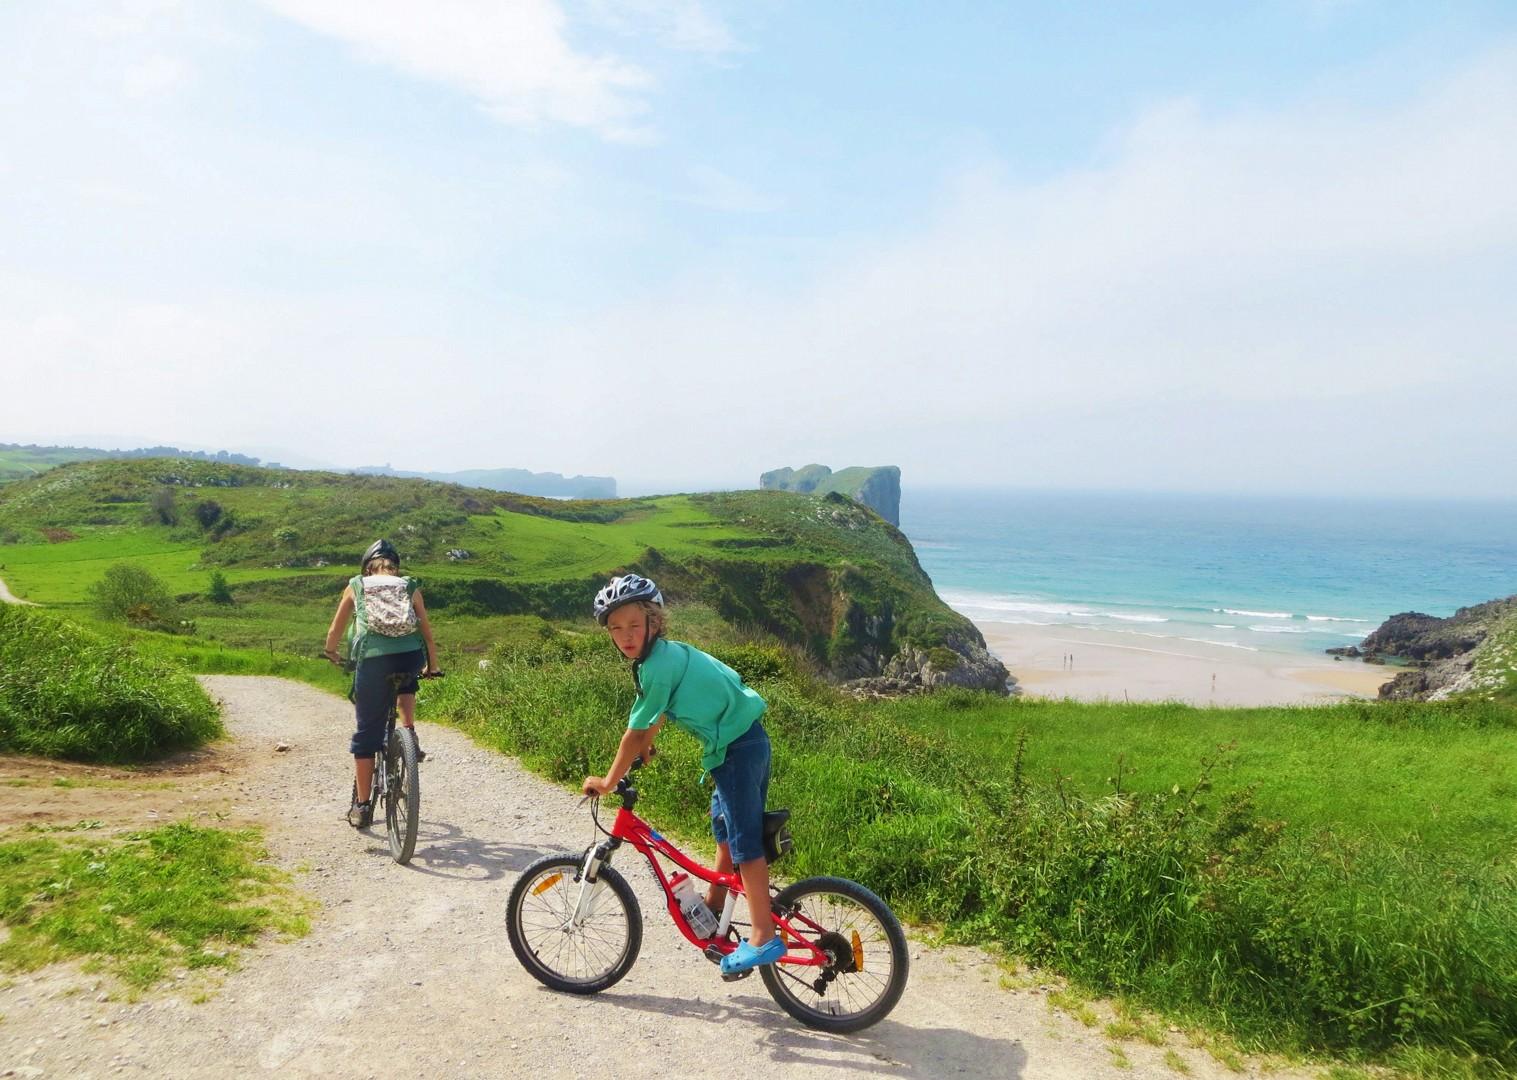 _Holiday.616.17568.jpg - Spain - Asturian Coastal Ride - Guided Family Cycling Holiday - Family Cycling